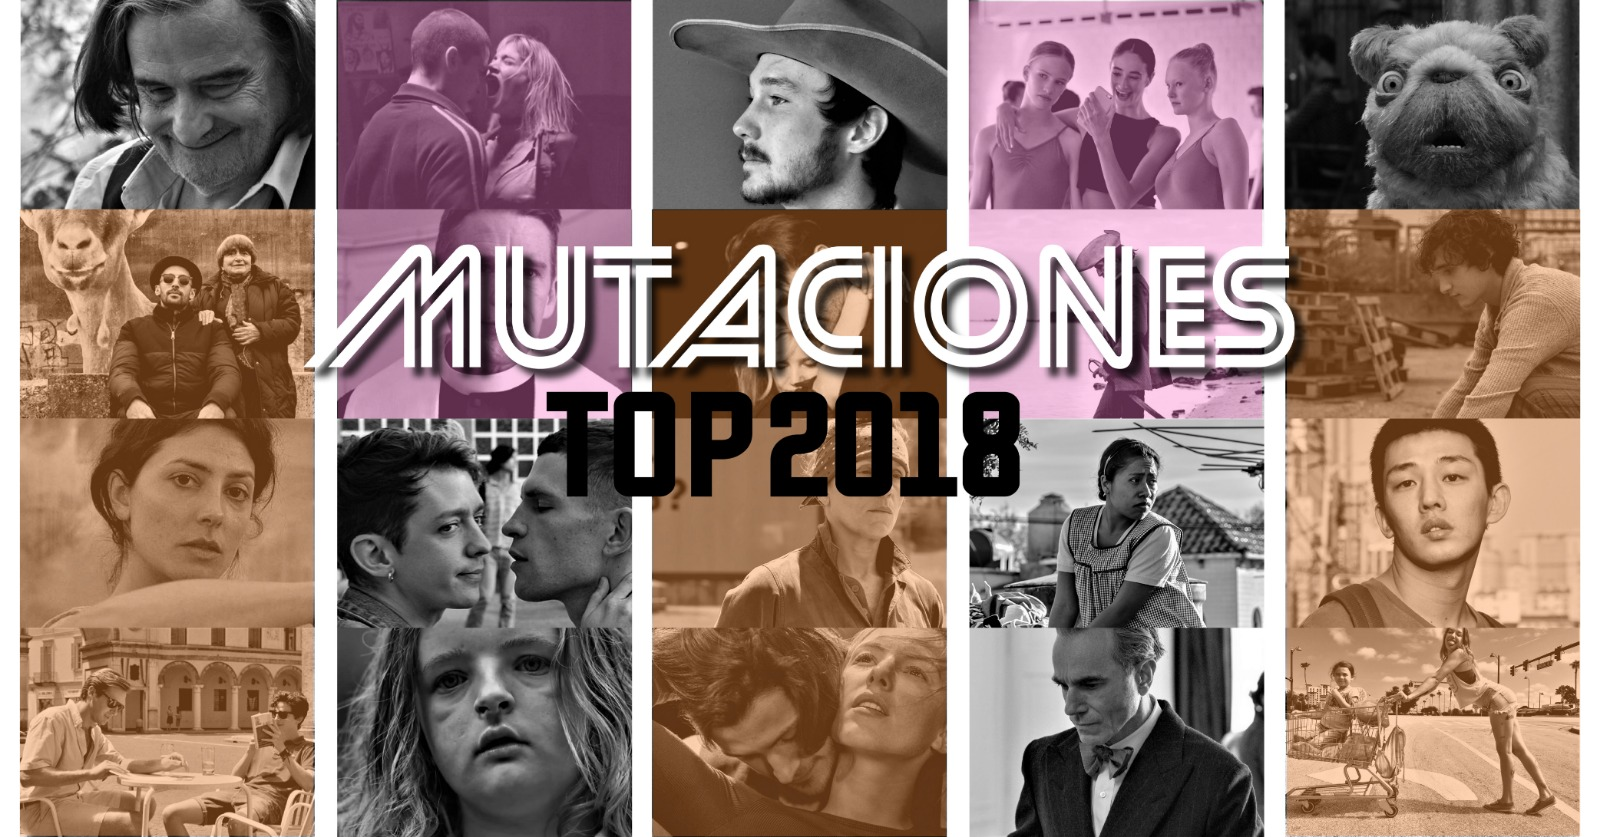 top 2018 mejores peliculas series